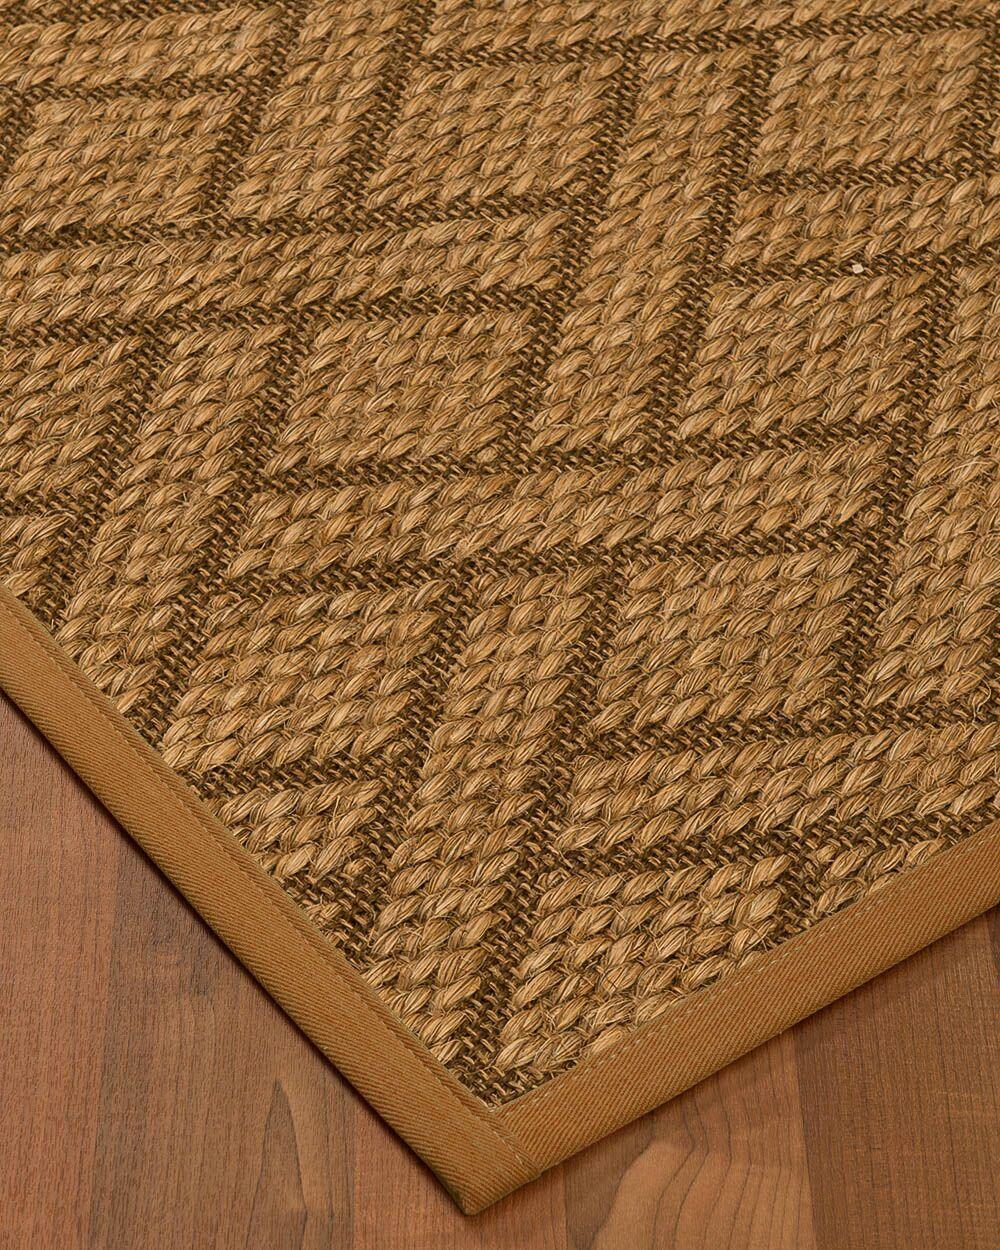 Kimbro Hand-Woven Beige Area Rug Rug Size: Rectangle 5' x 8'